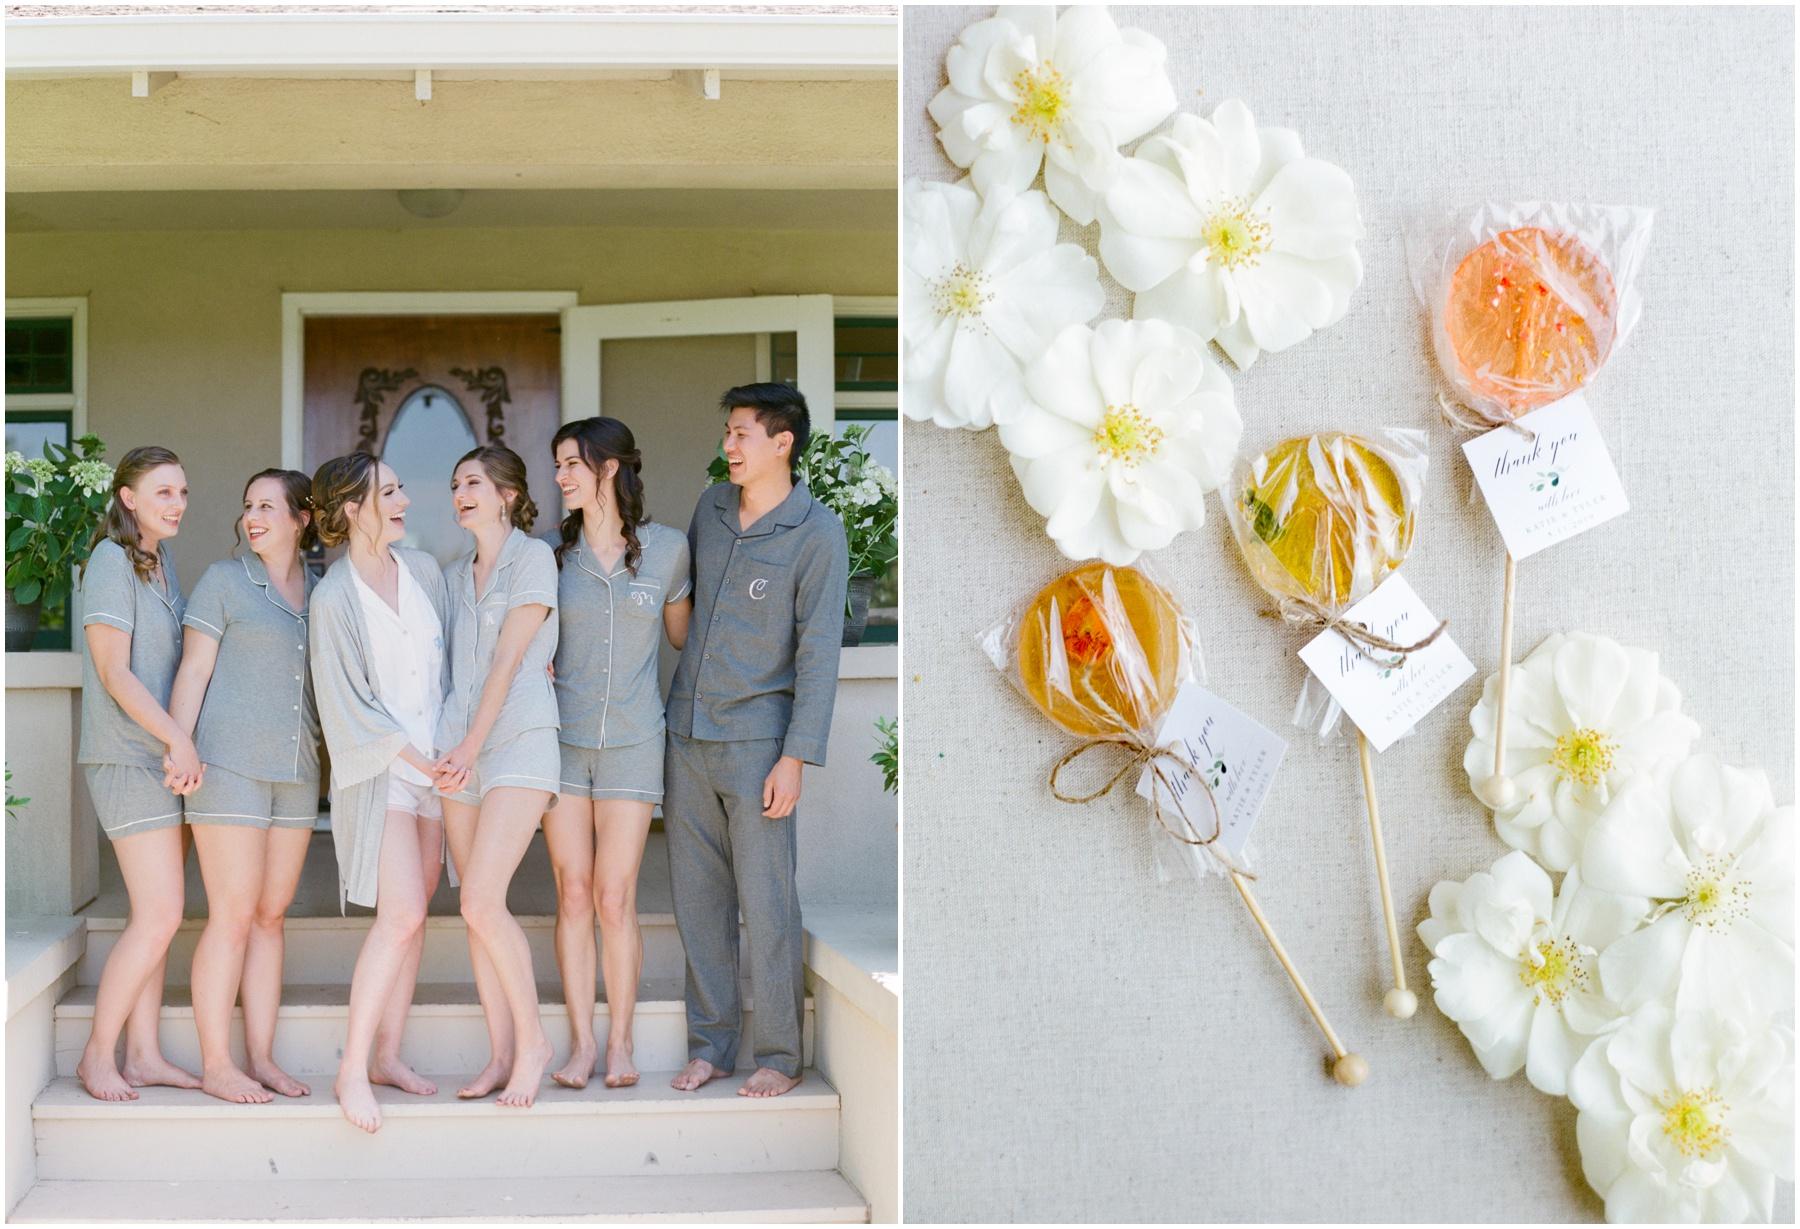 Scribner-bend-vineyards-wedding-sacramento-california-Kristine-Herman-Photography-7.jpg